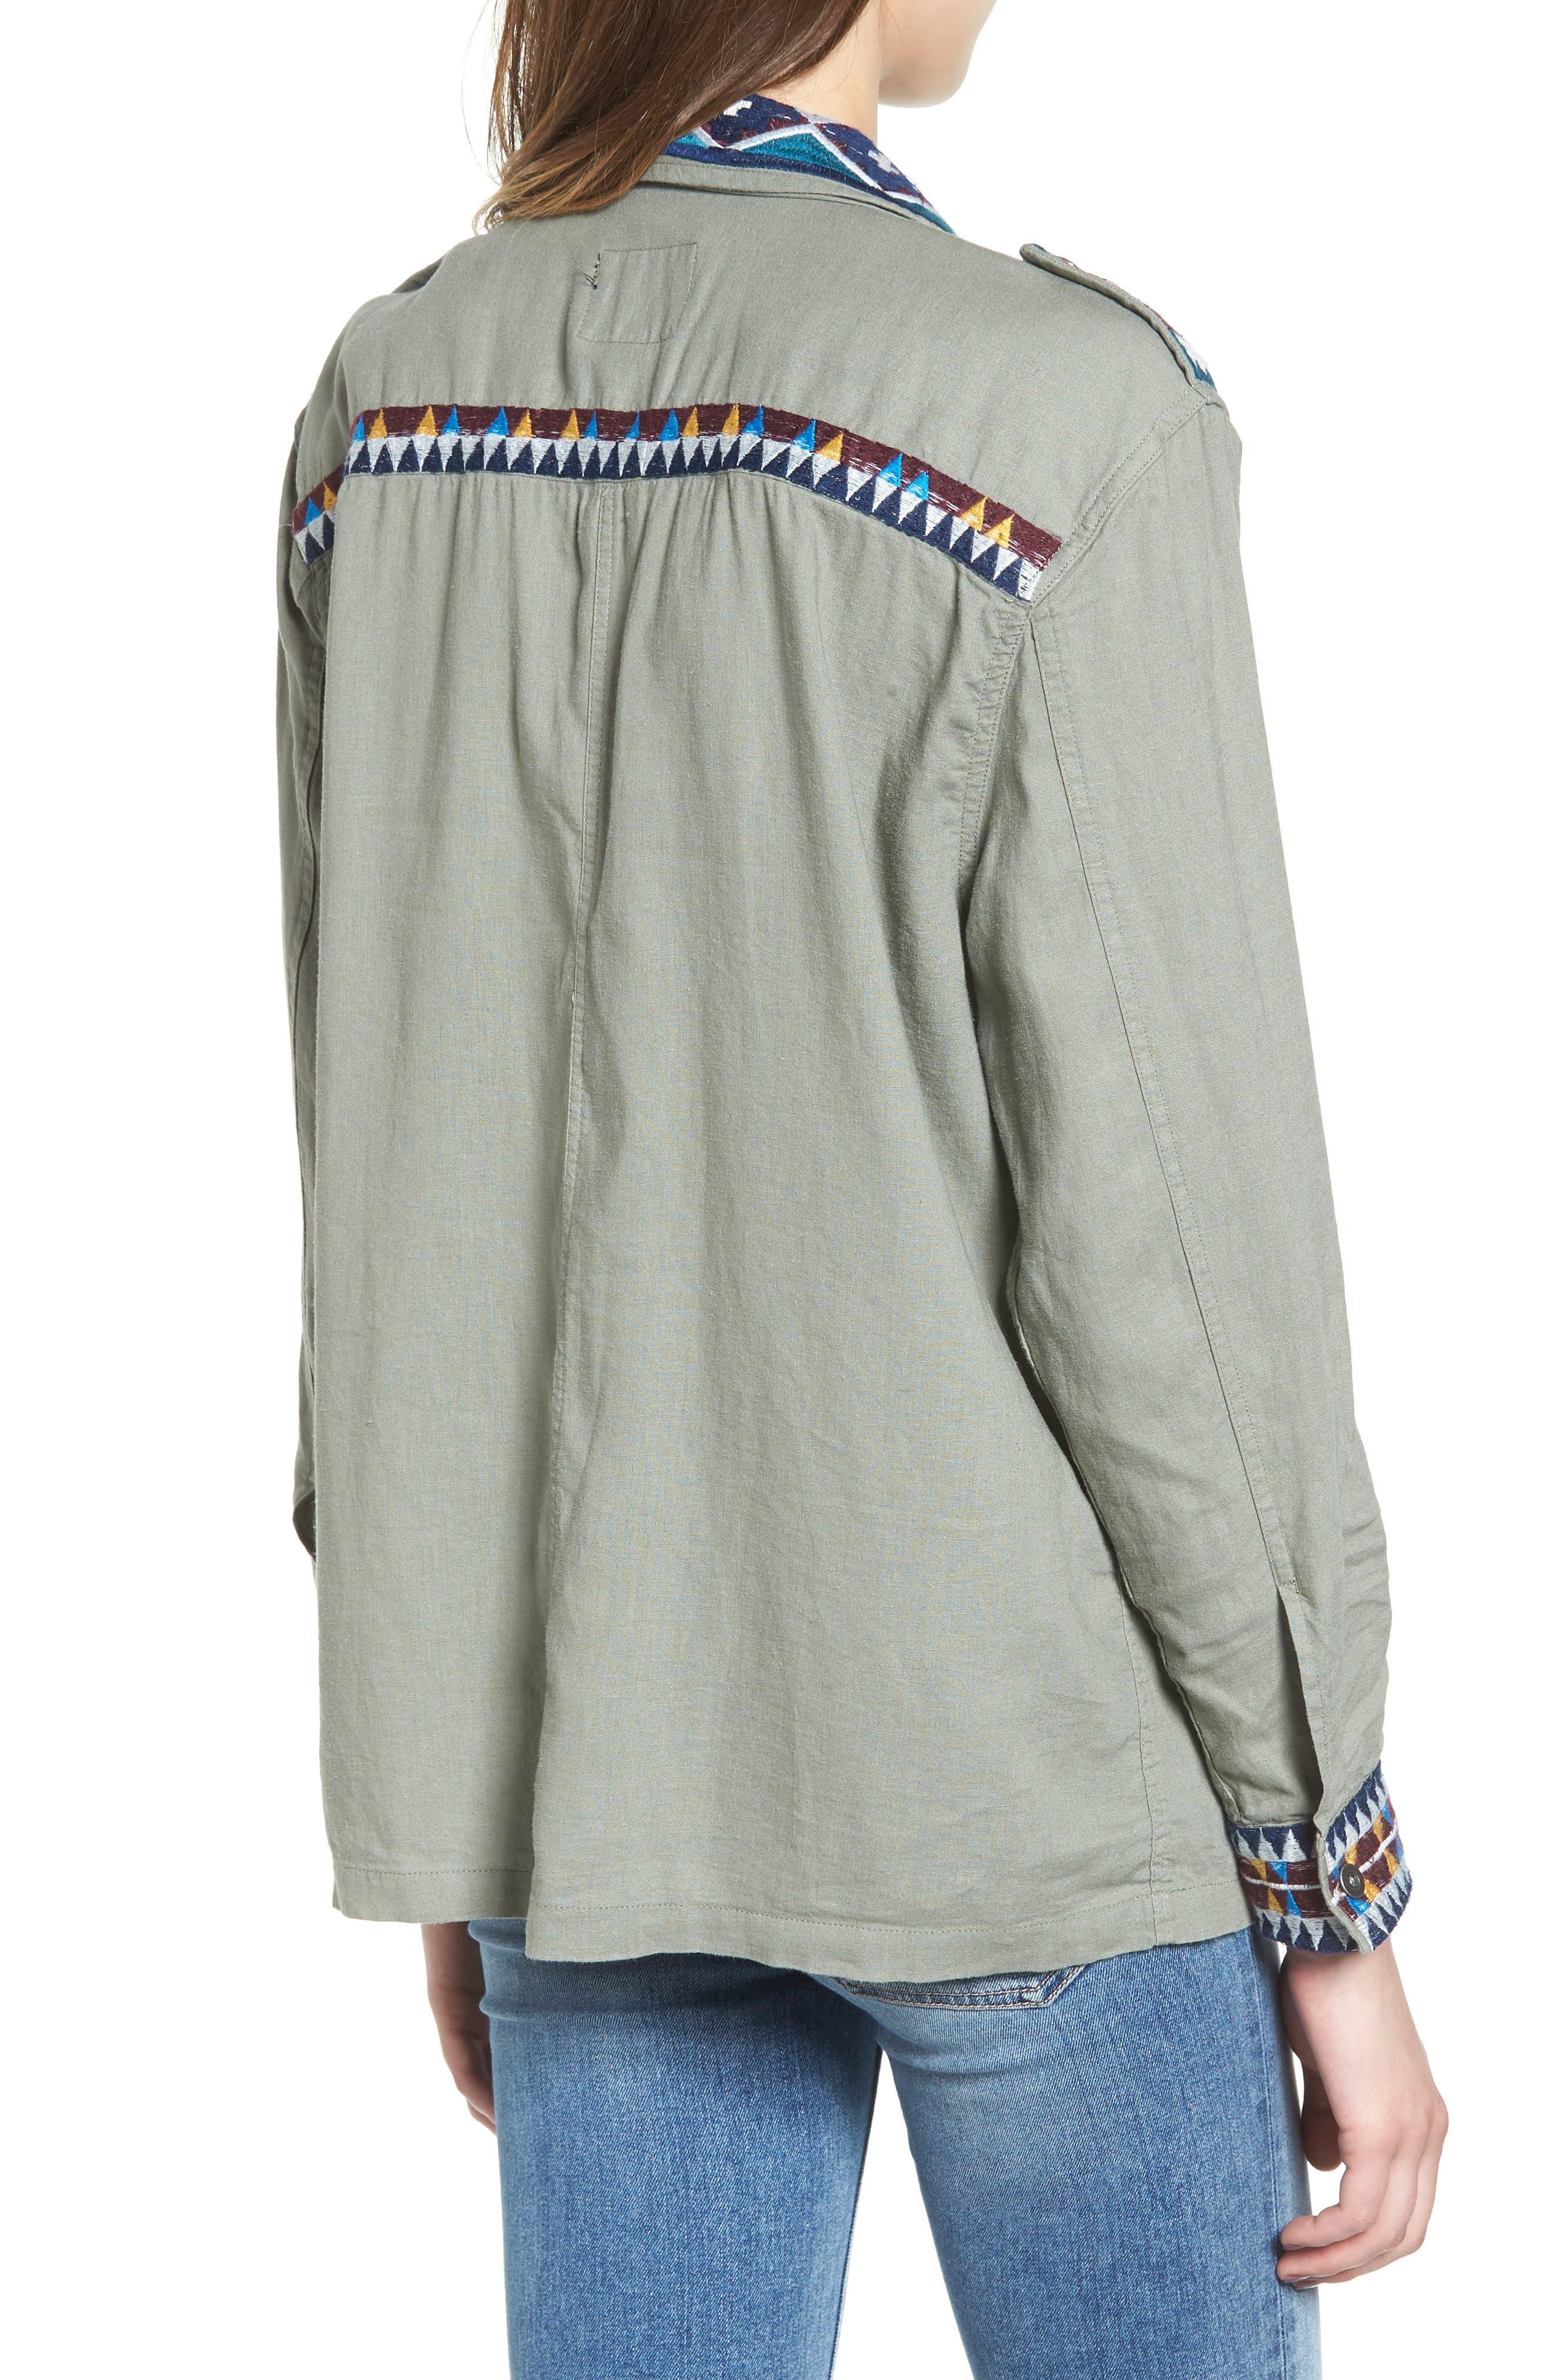 Kona Embroidered Shirt,                             Alternate thumbnail 2, color,                             320